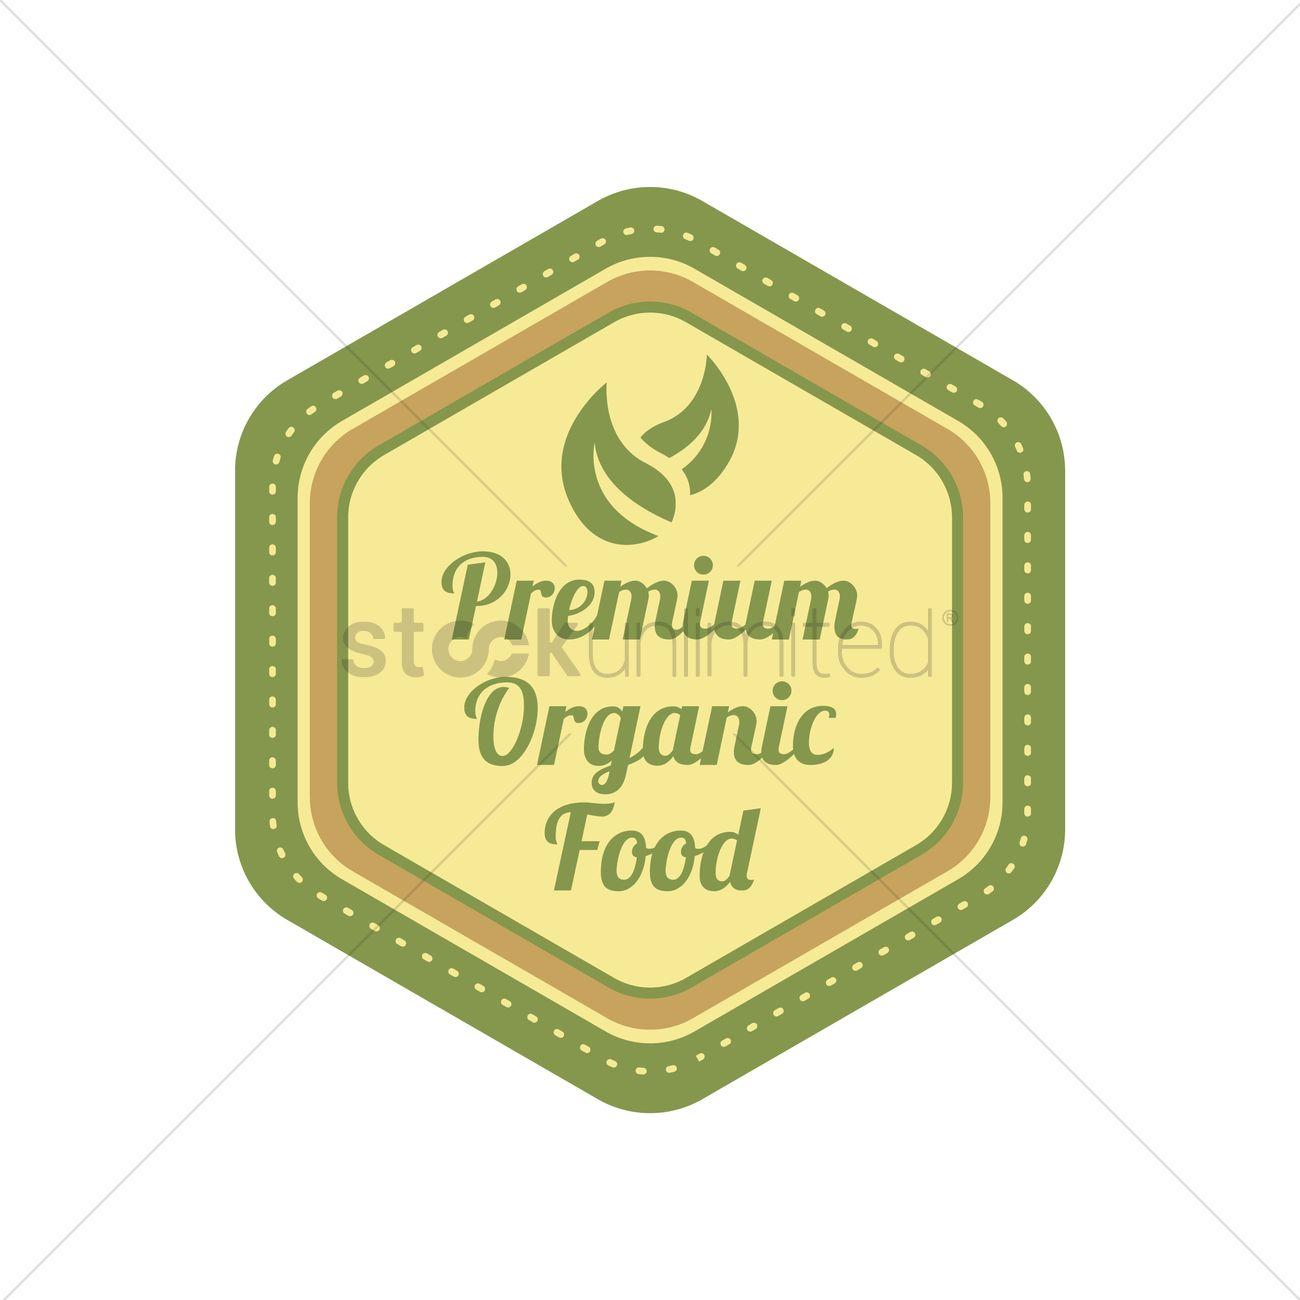 Organic food label design Vector Image - 2029883